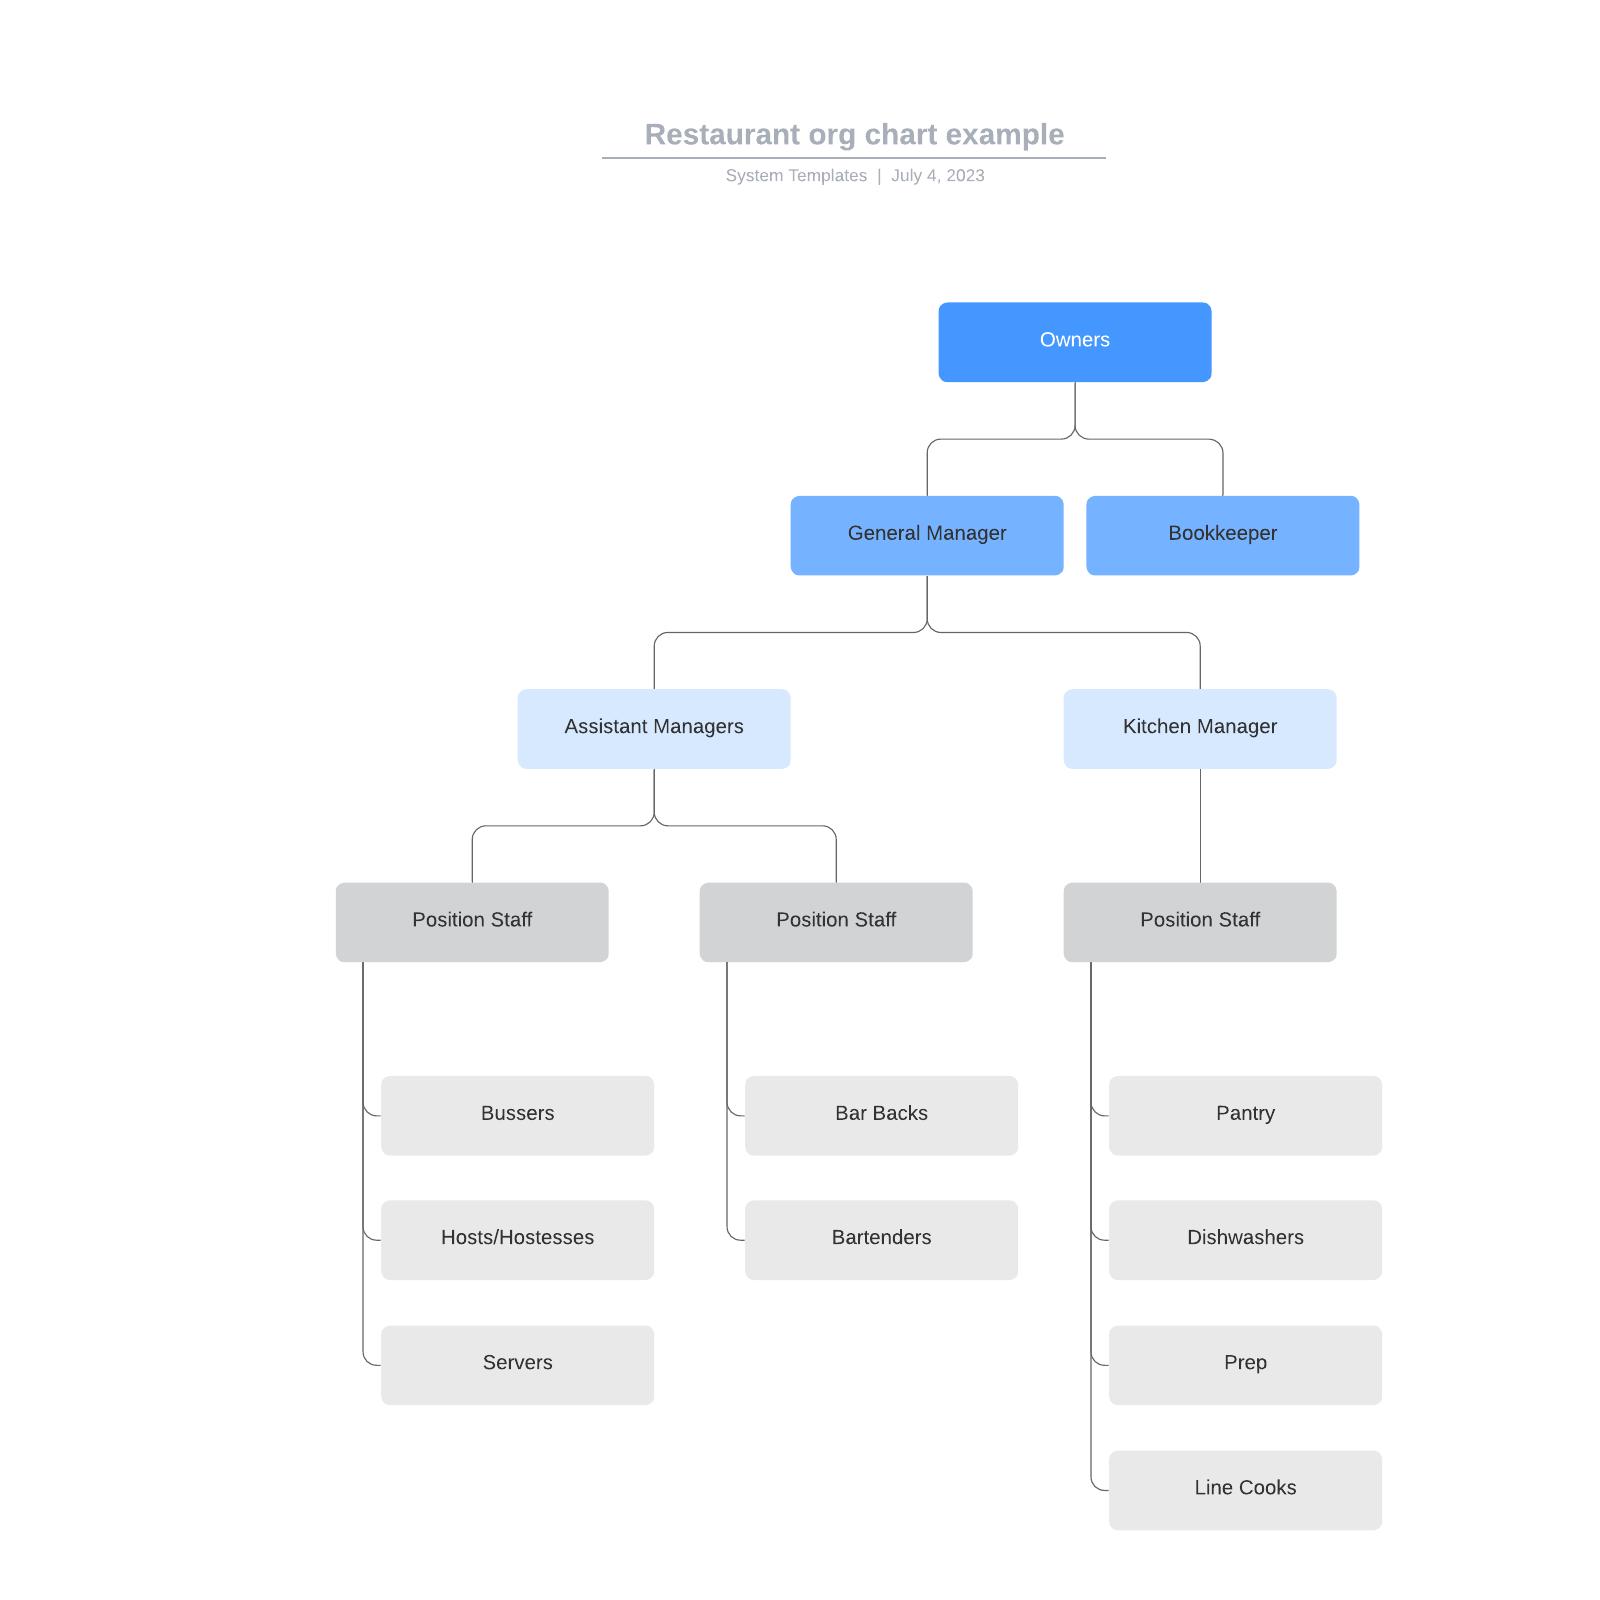 Restaurant org chart example